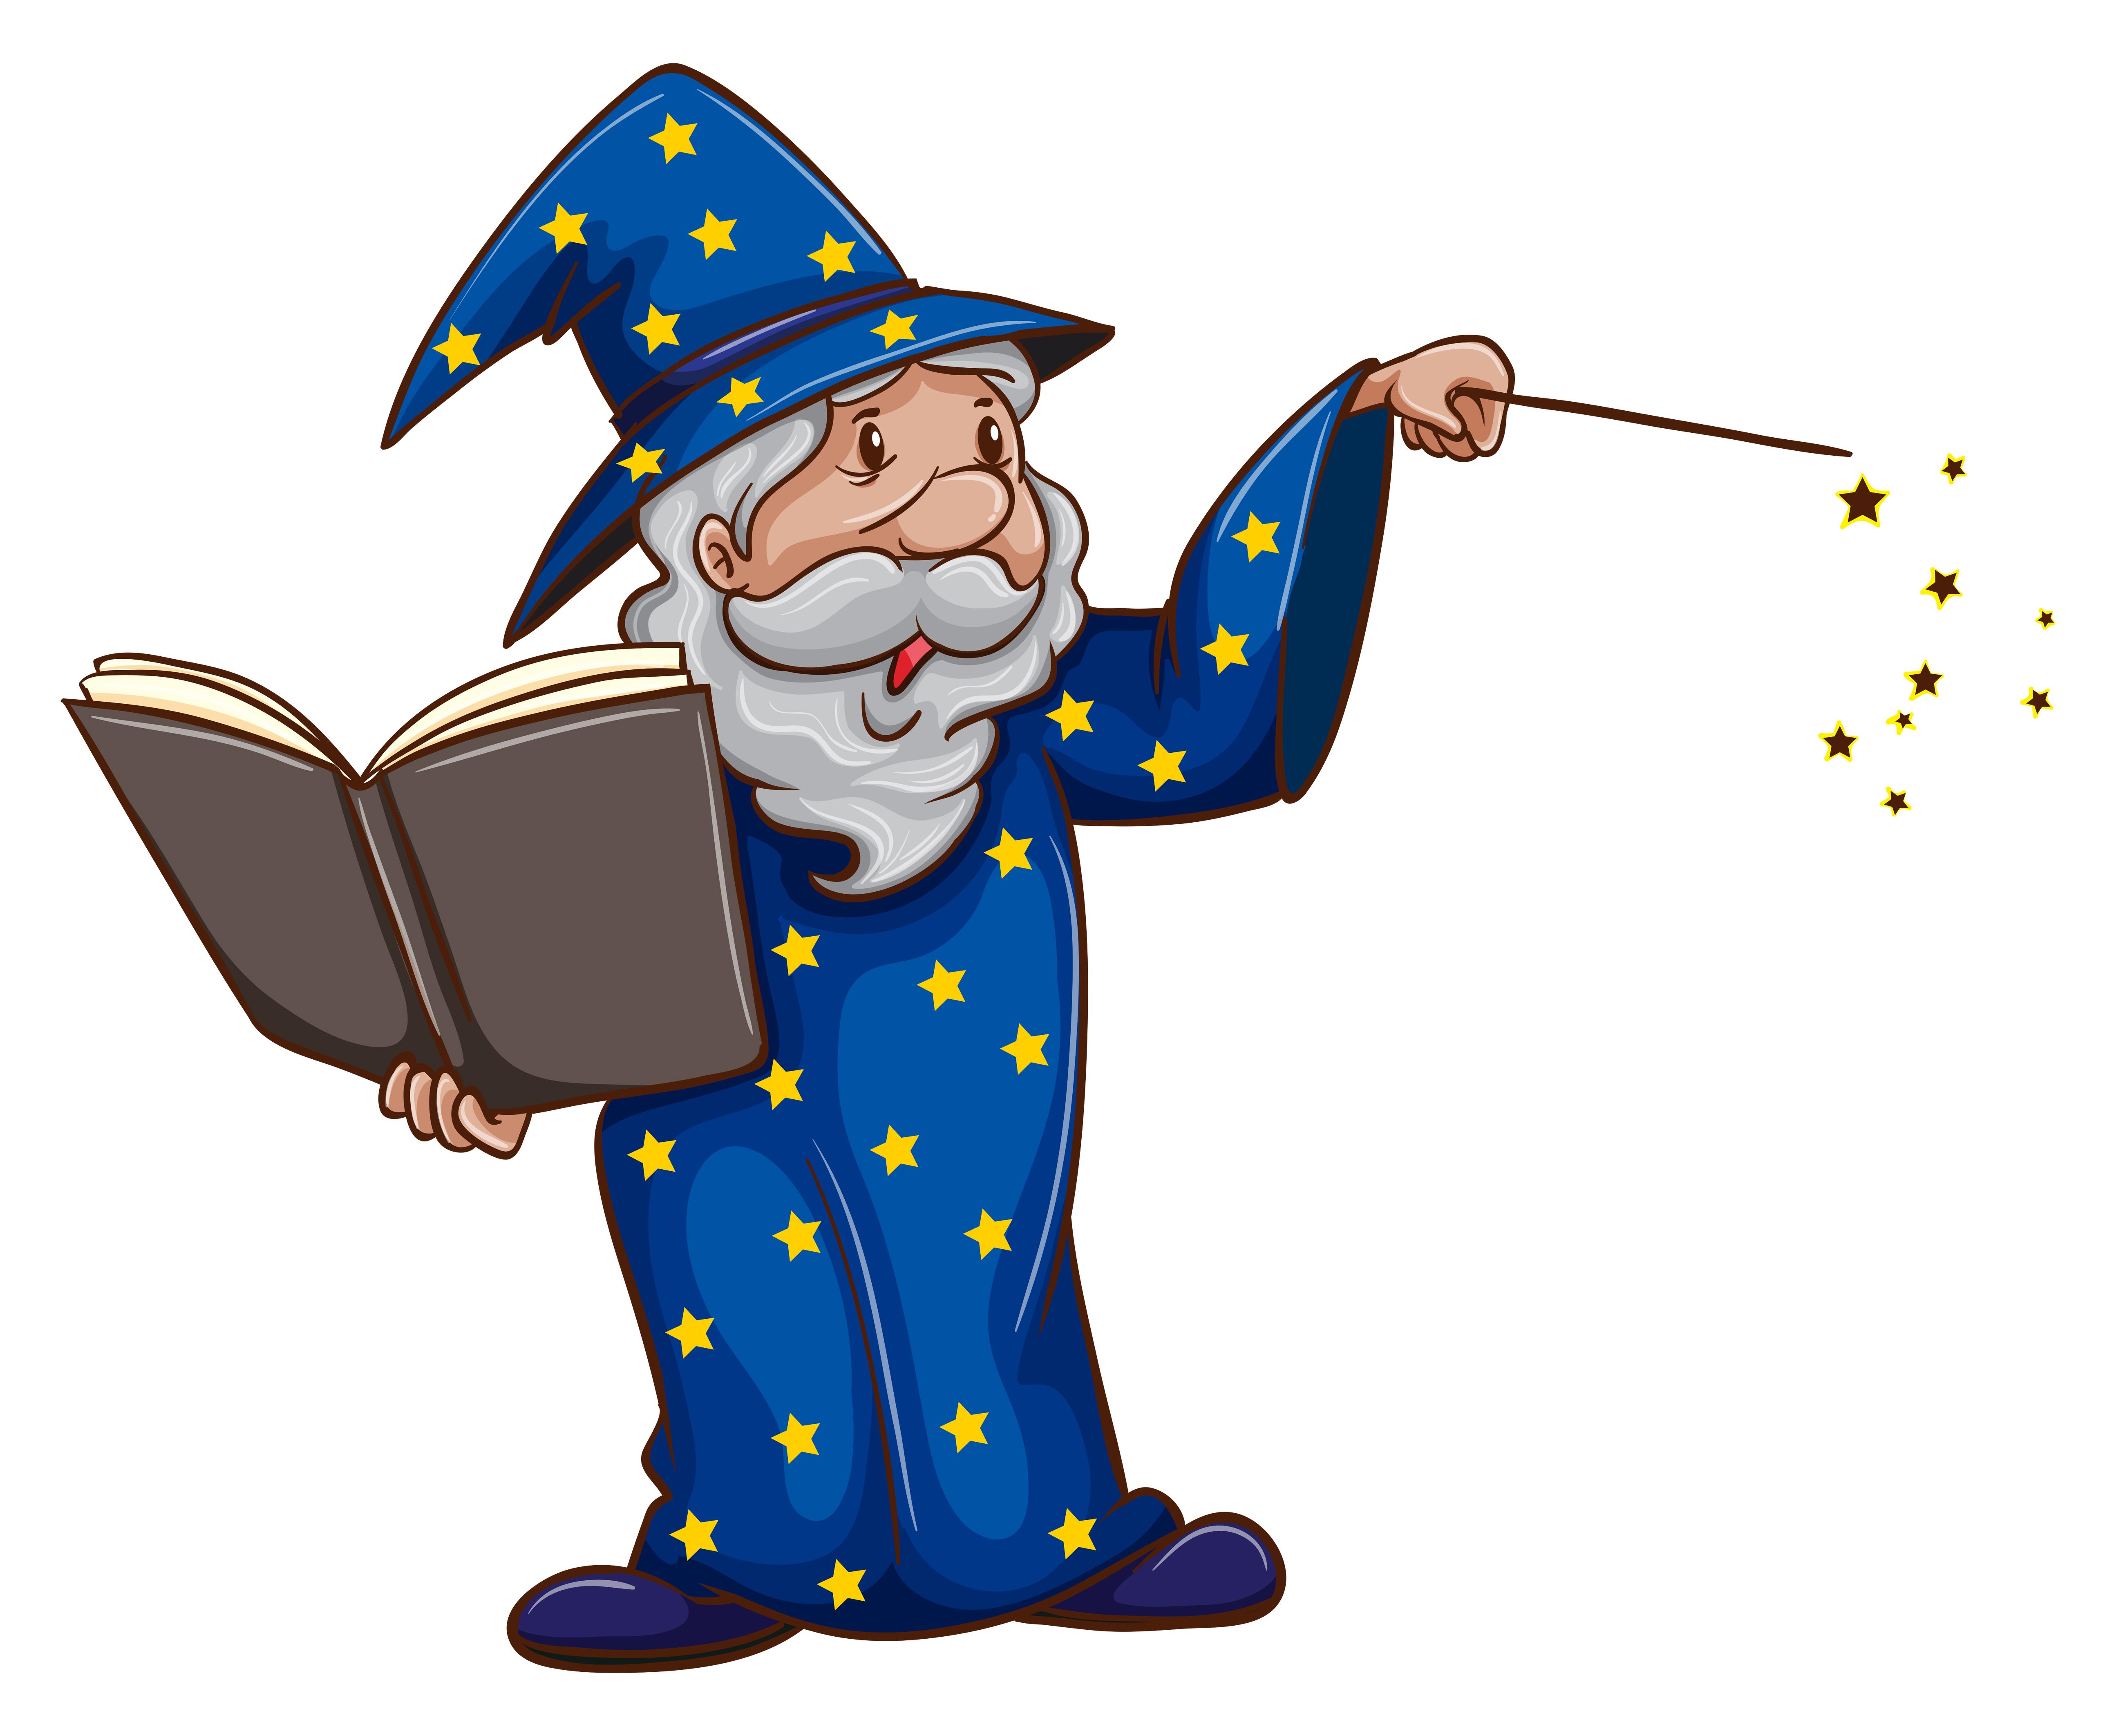 Wizard Pics, Fantasy Collection